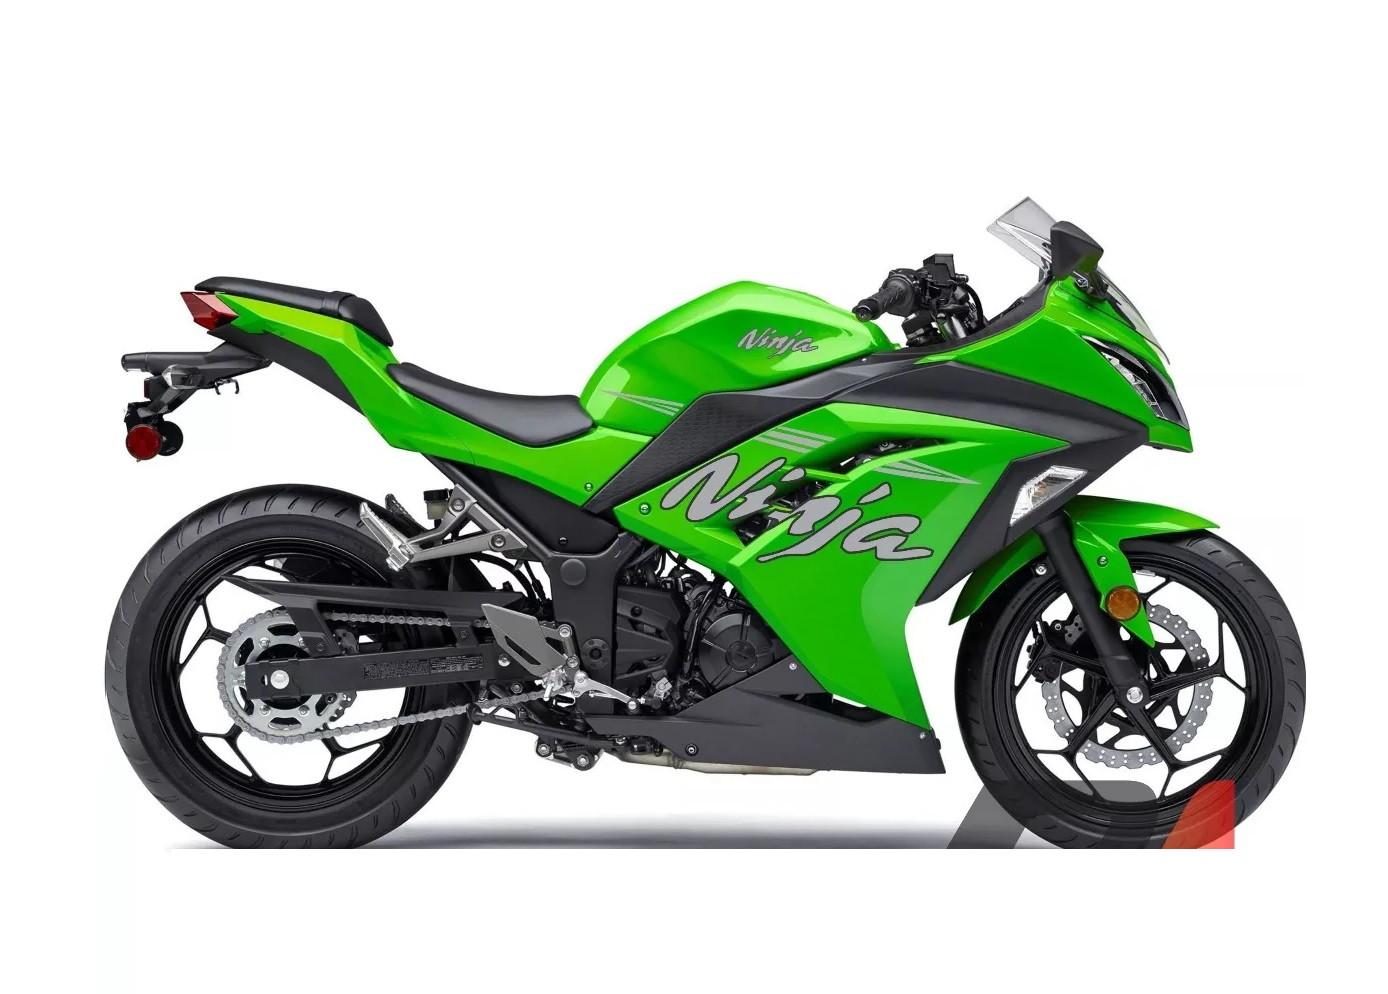 Kit Adesivo Kawasaki Ninja 300 Verde Cinza Cores Frete Grati No Elo7 Power Adesivos Db0cc1